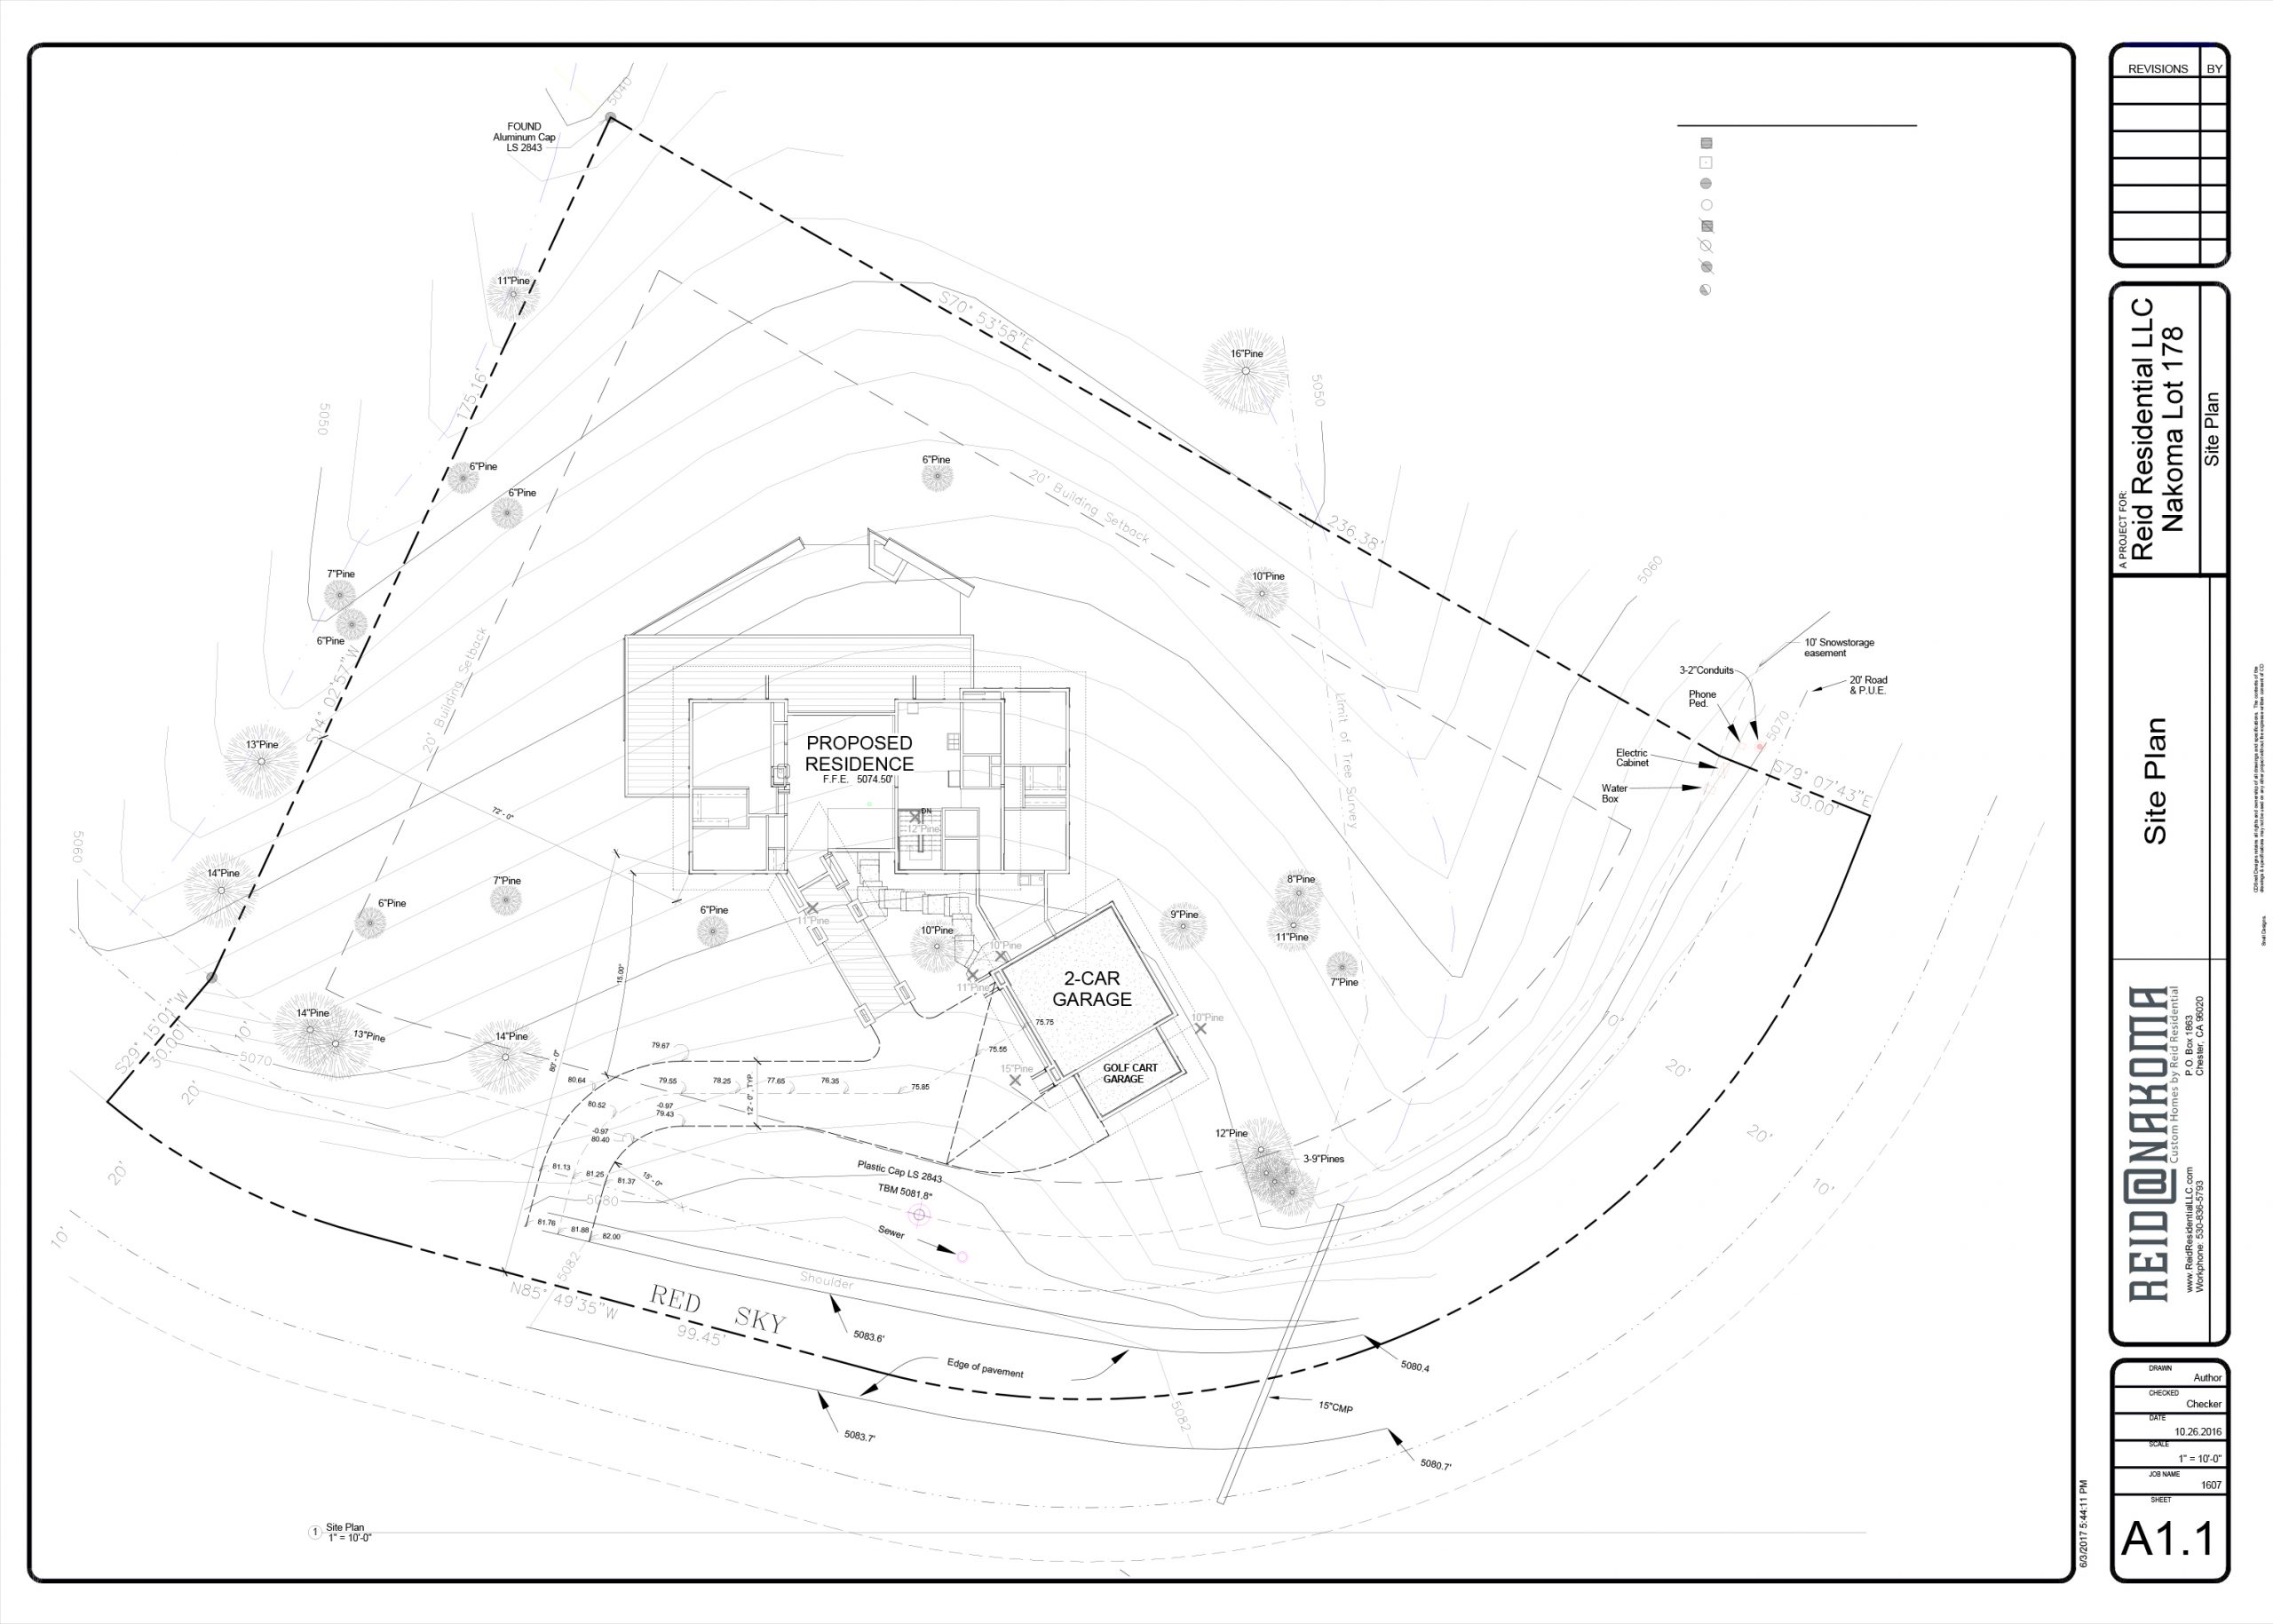 Nakoma_Lot178_Architectural 1